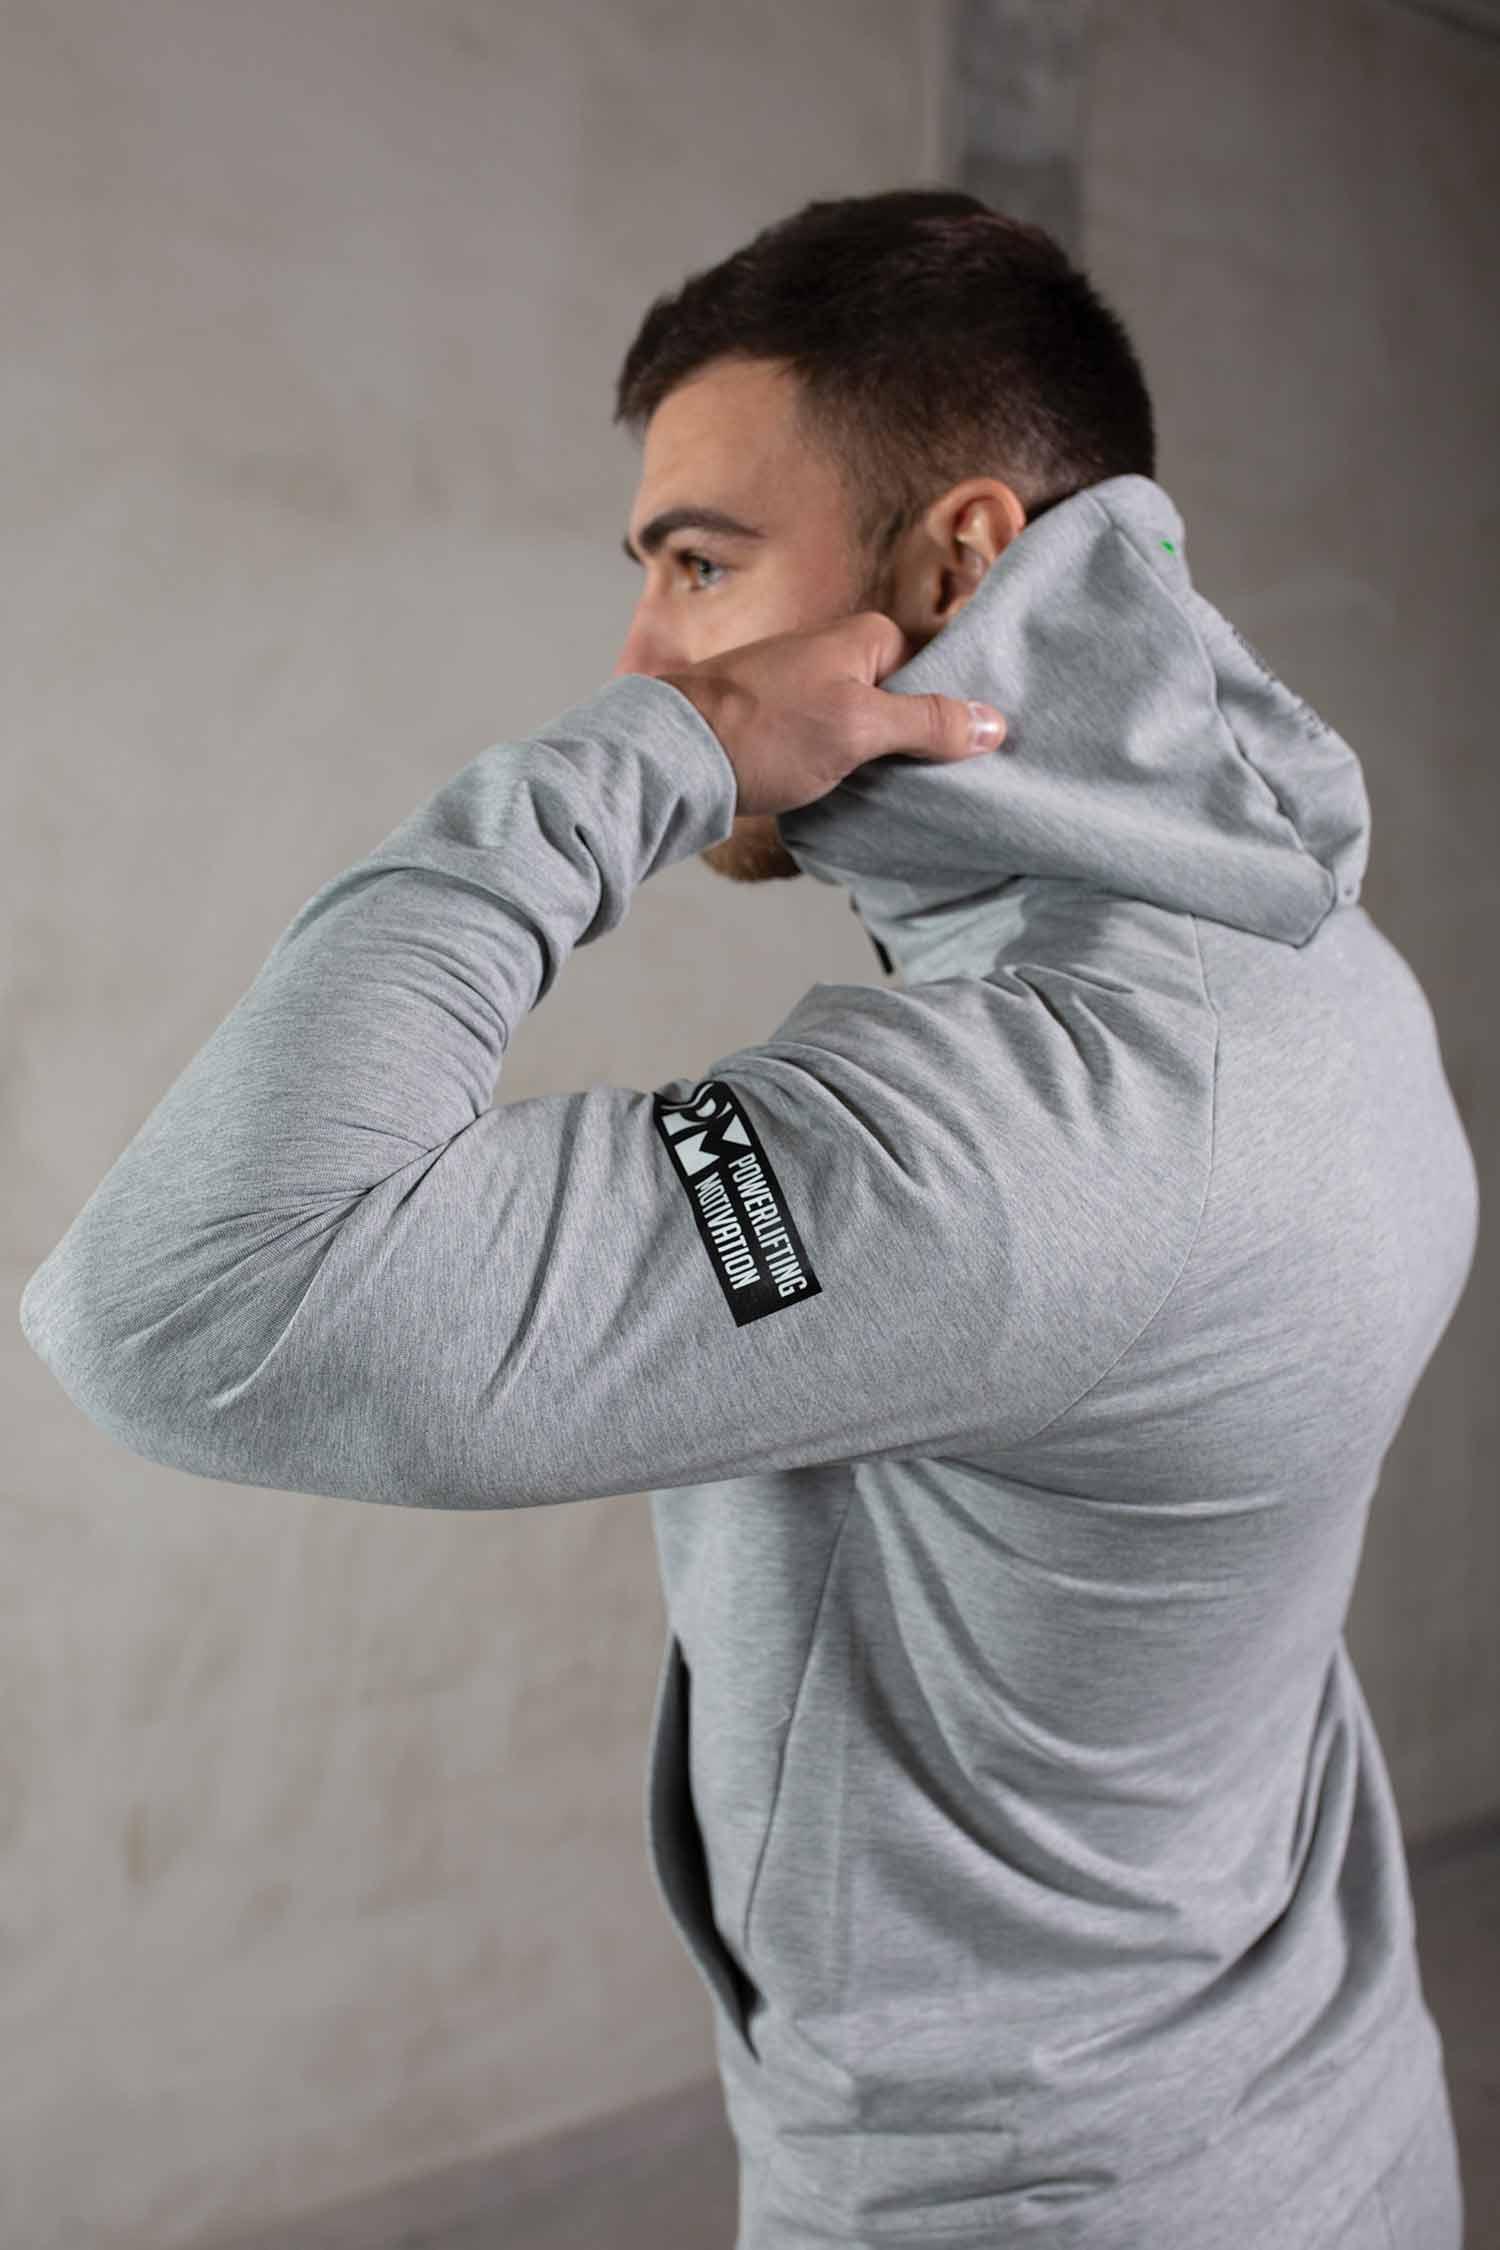 essentils-grey-track-suit-details